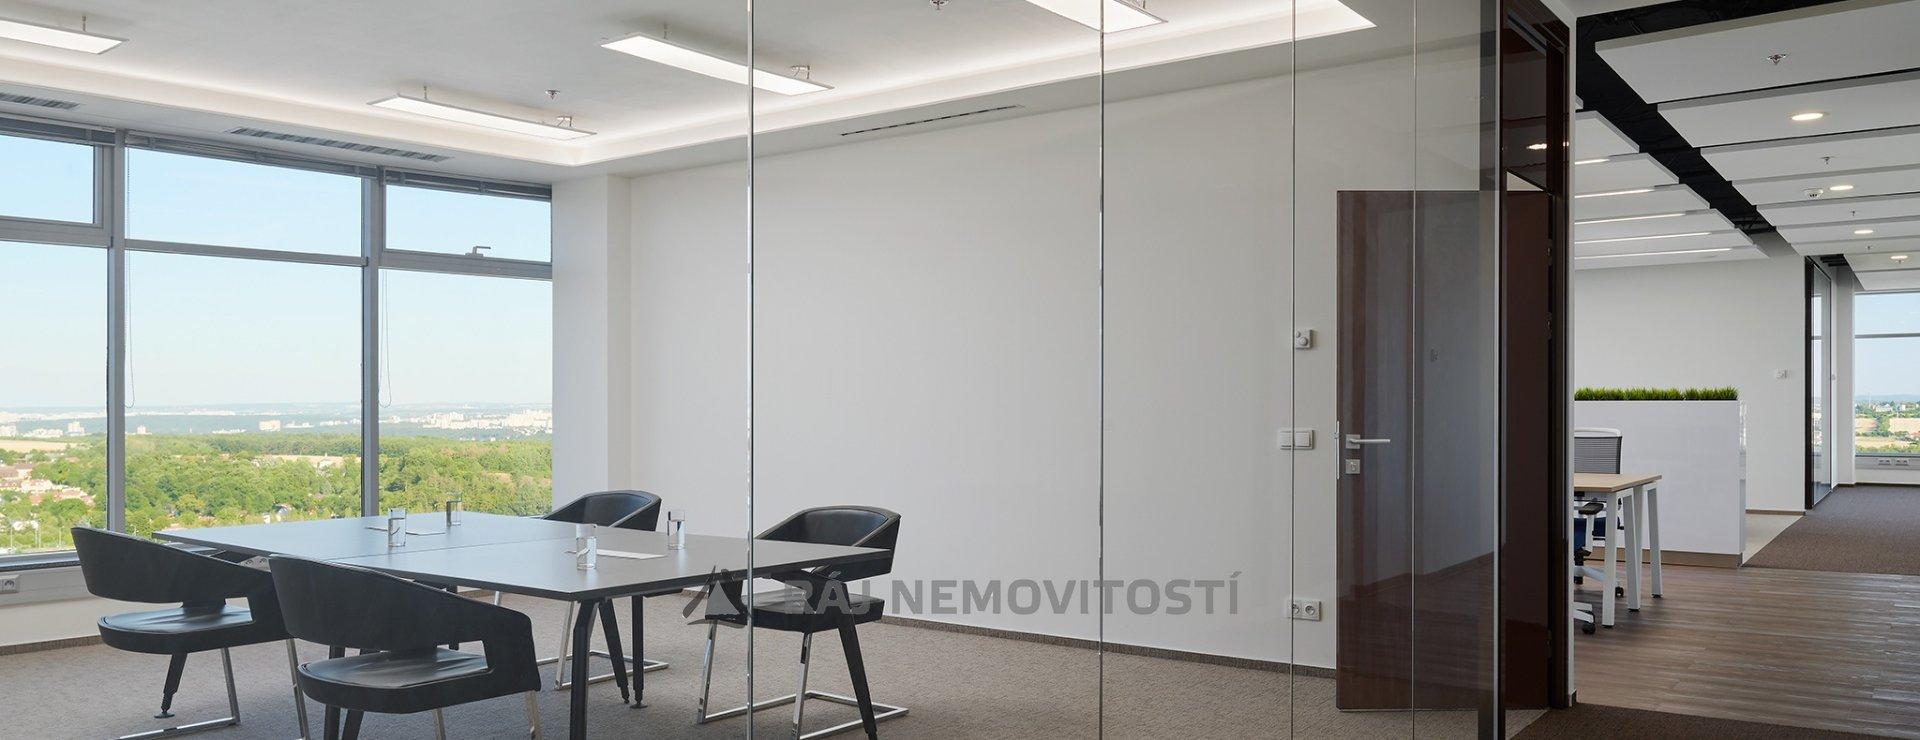 Show Suite_meeting room